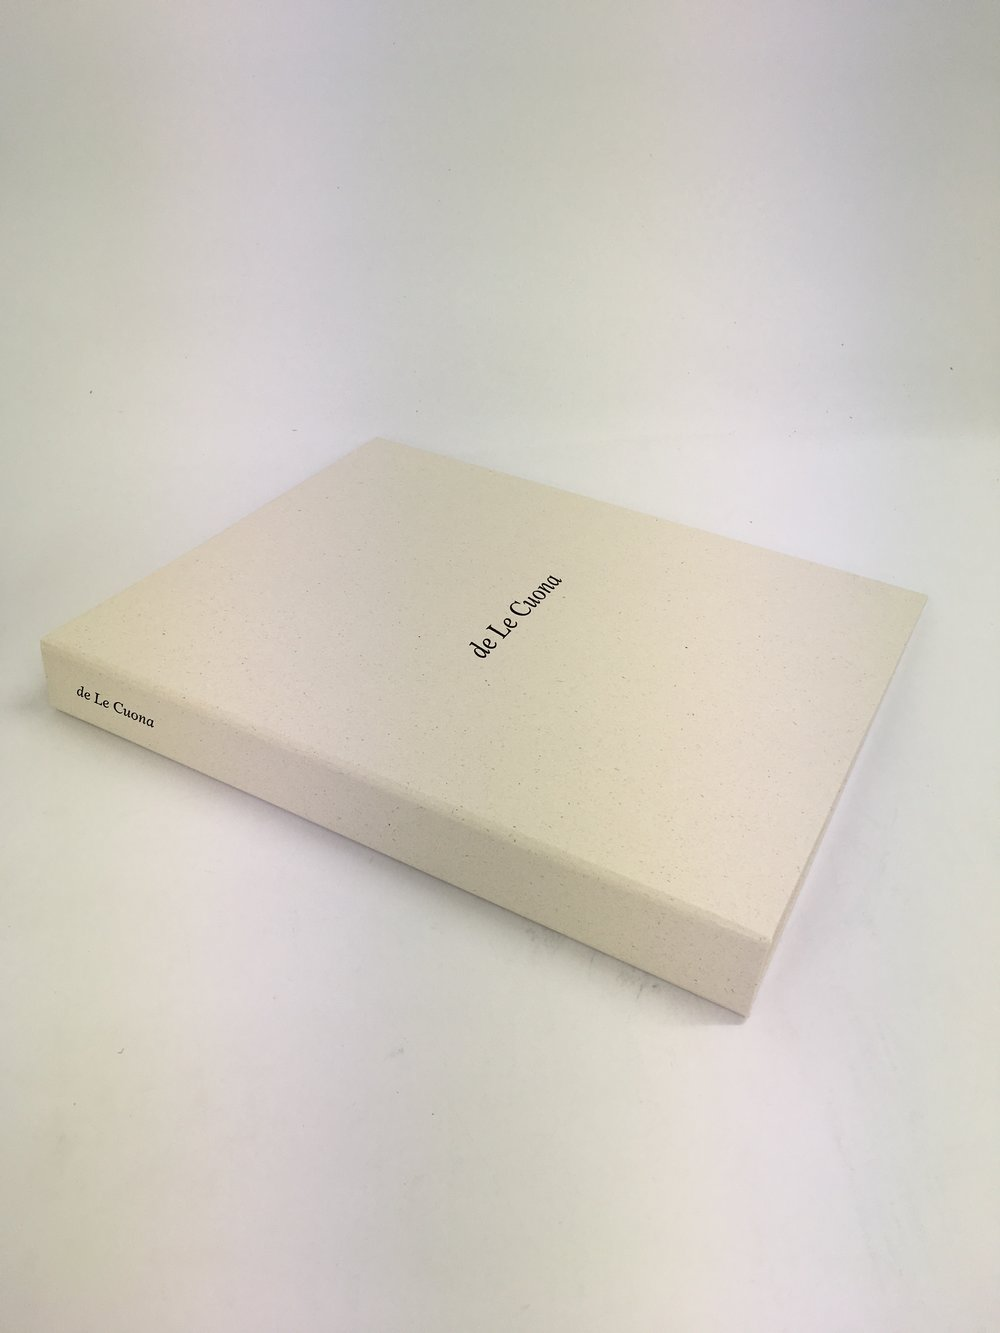 bespoke presentation folder.JPG